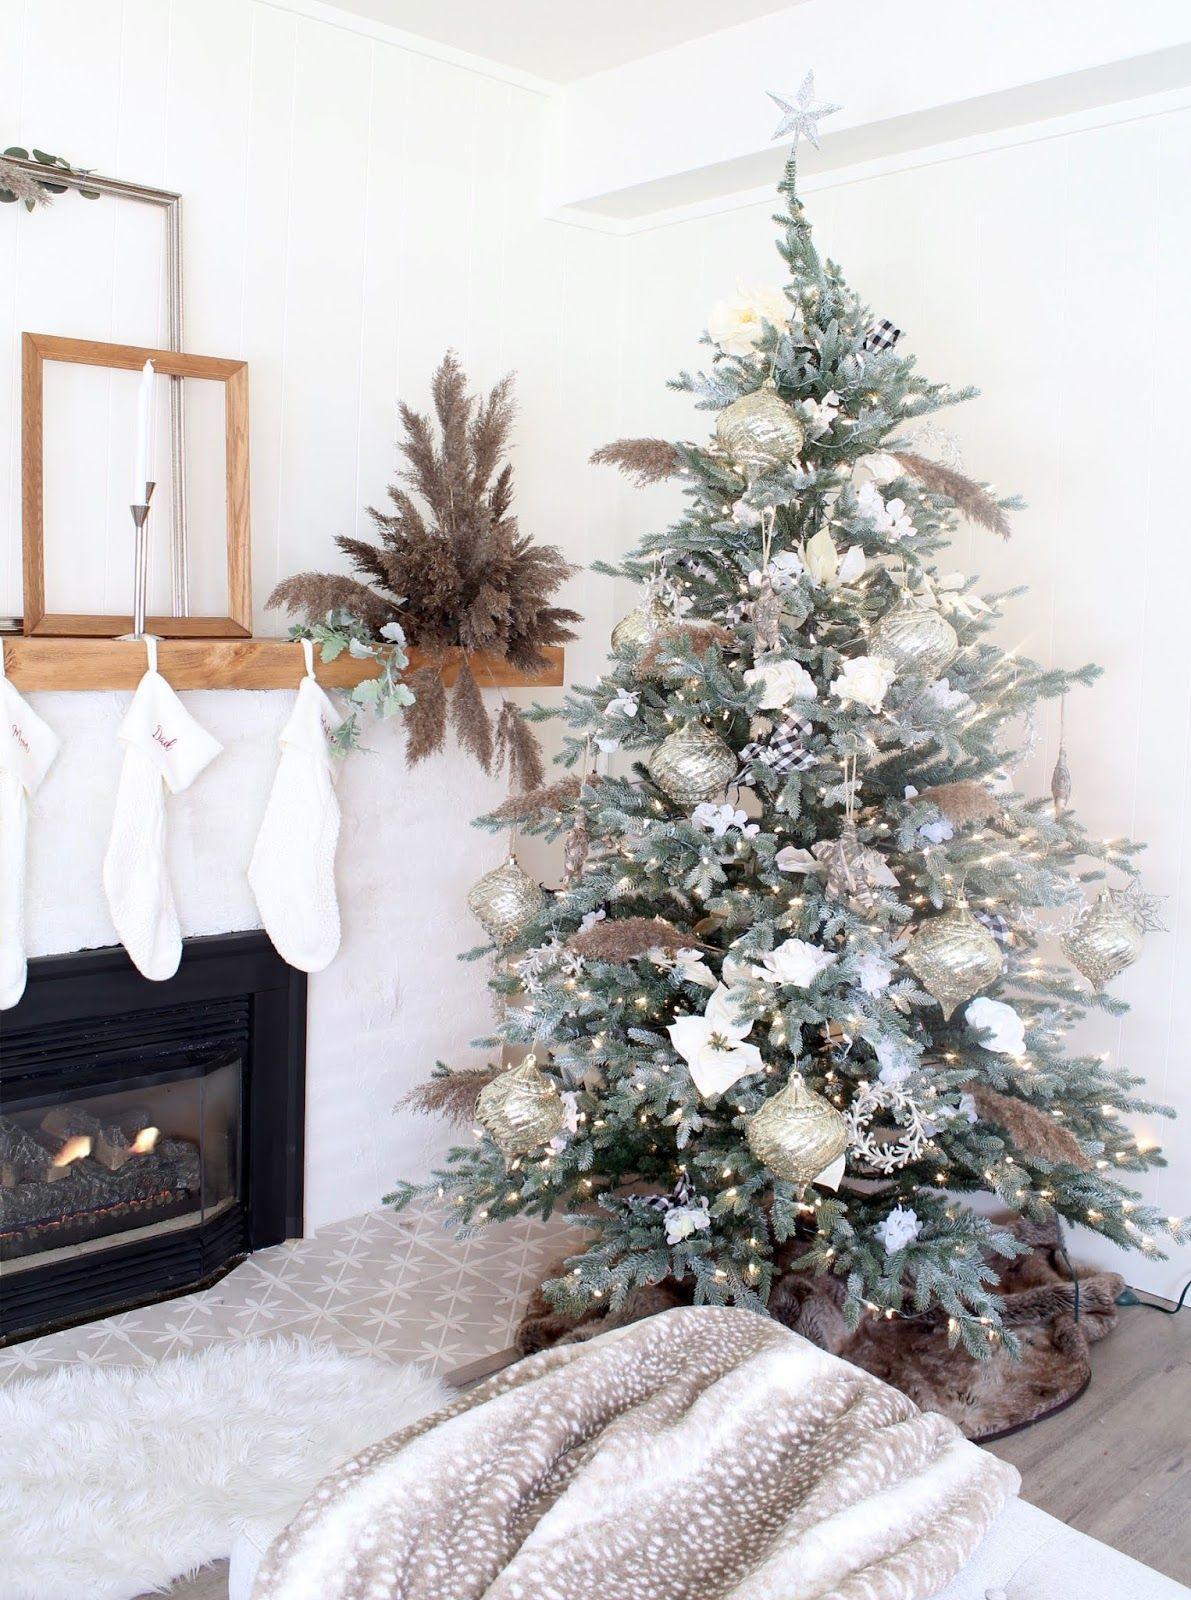 Harlow Thistle Home Design Lifestyle Diy Nordic Christmas Decorating Ideas Holiday Decor Christmas Scandinavian Holiday Decor Nordic Christmas Decorations